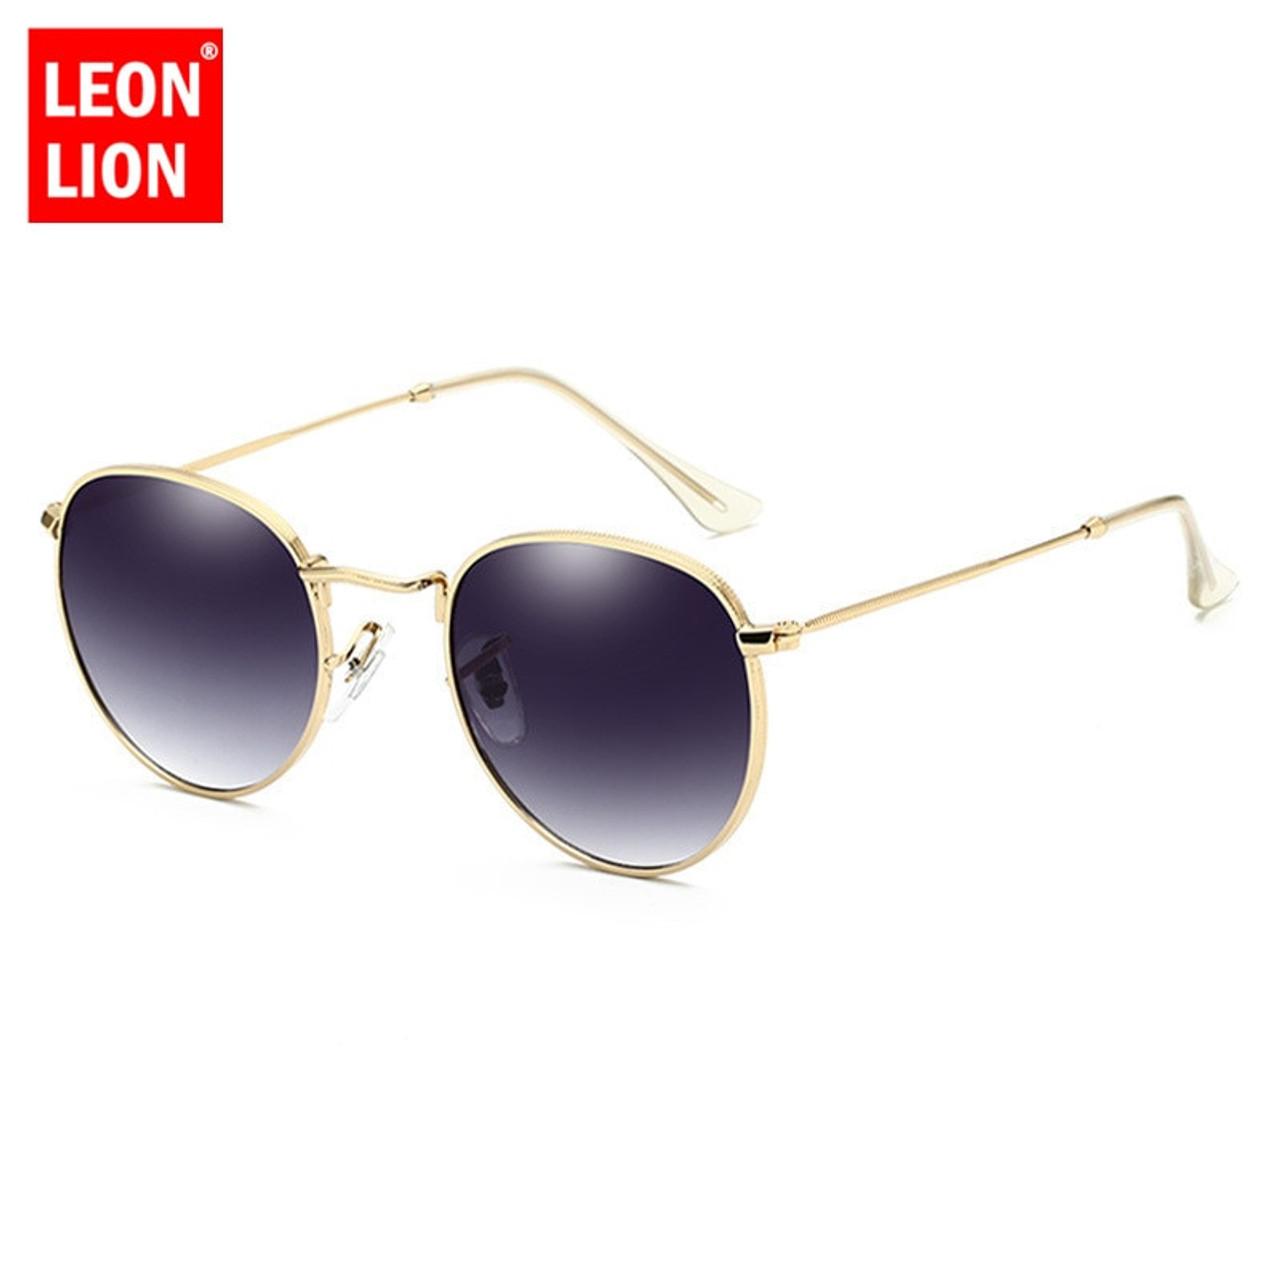 4946fc3254 ... LeonLion 2018 Luxury Mirror Sunglasses Women Men Brand Designer Glasses  Lady Round Sun Glasses Street ...